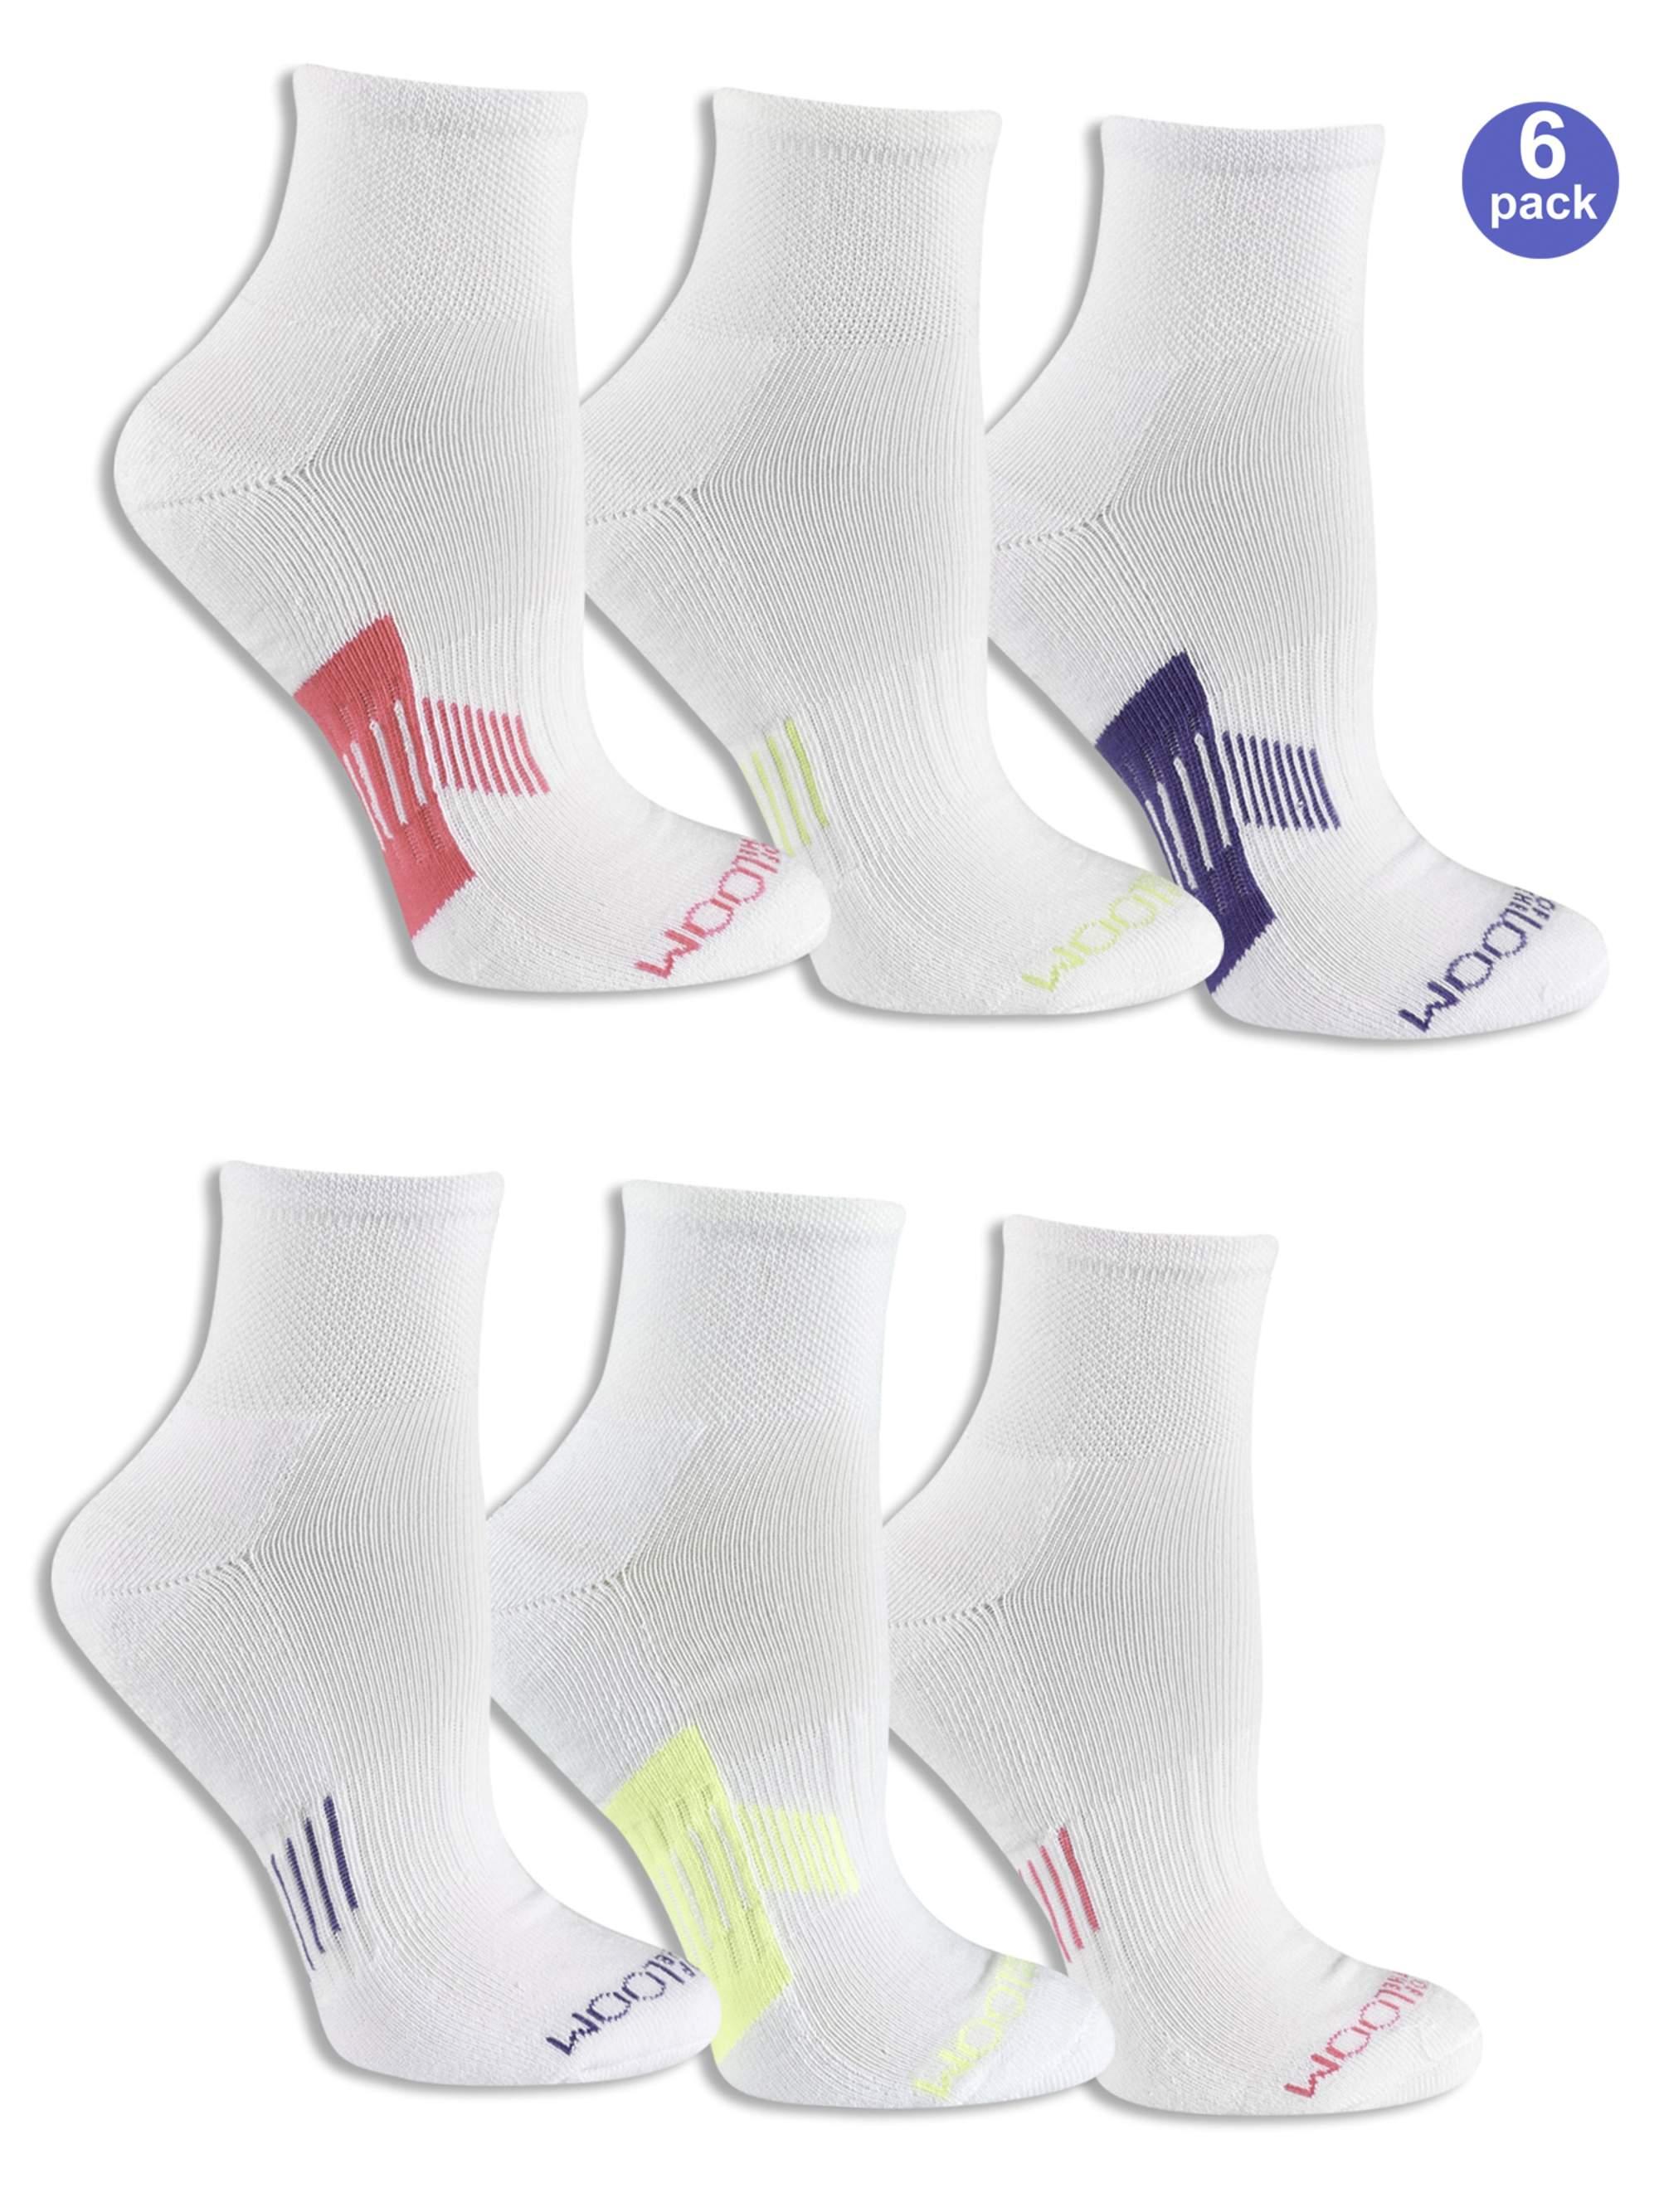 Fruit of the Loom Womens 6-Pair Low Cut Socks